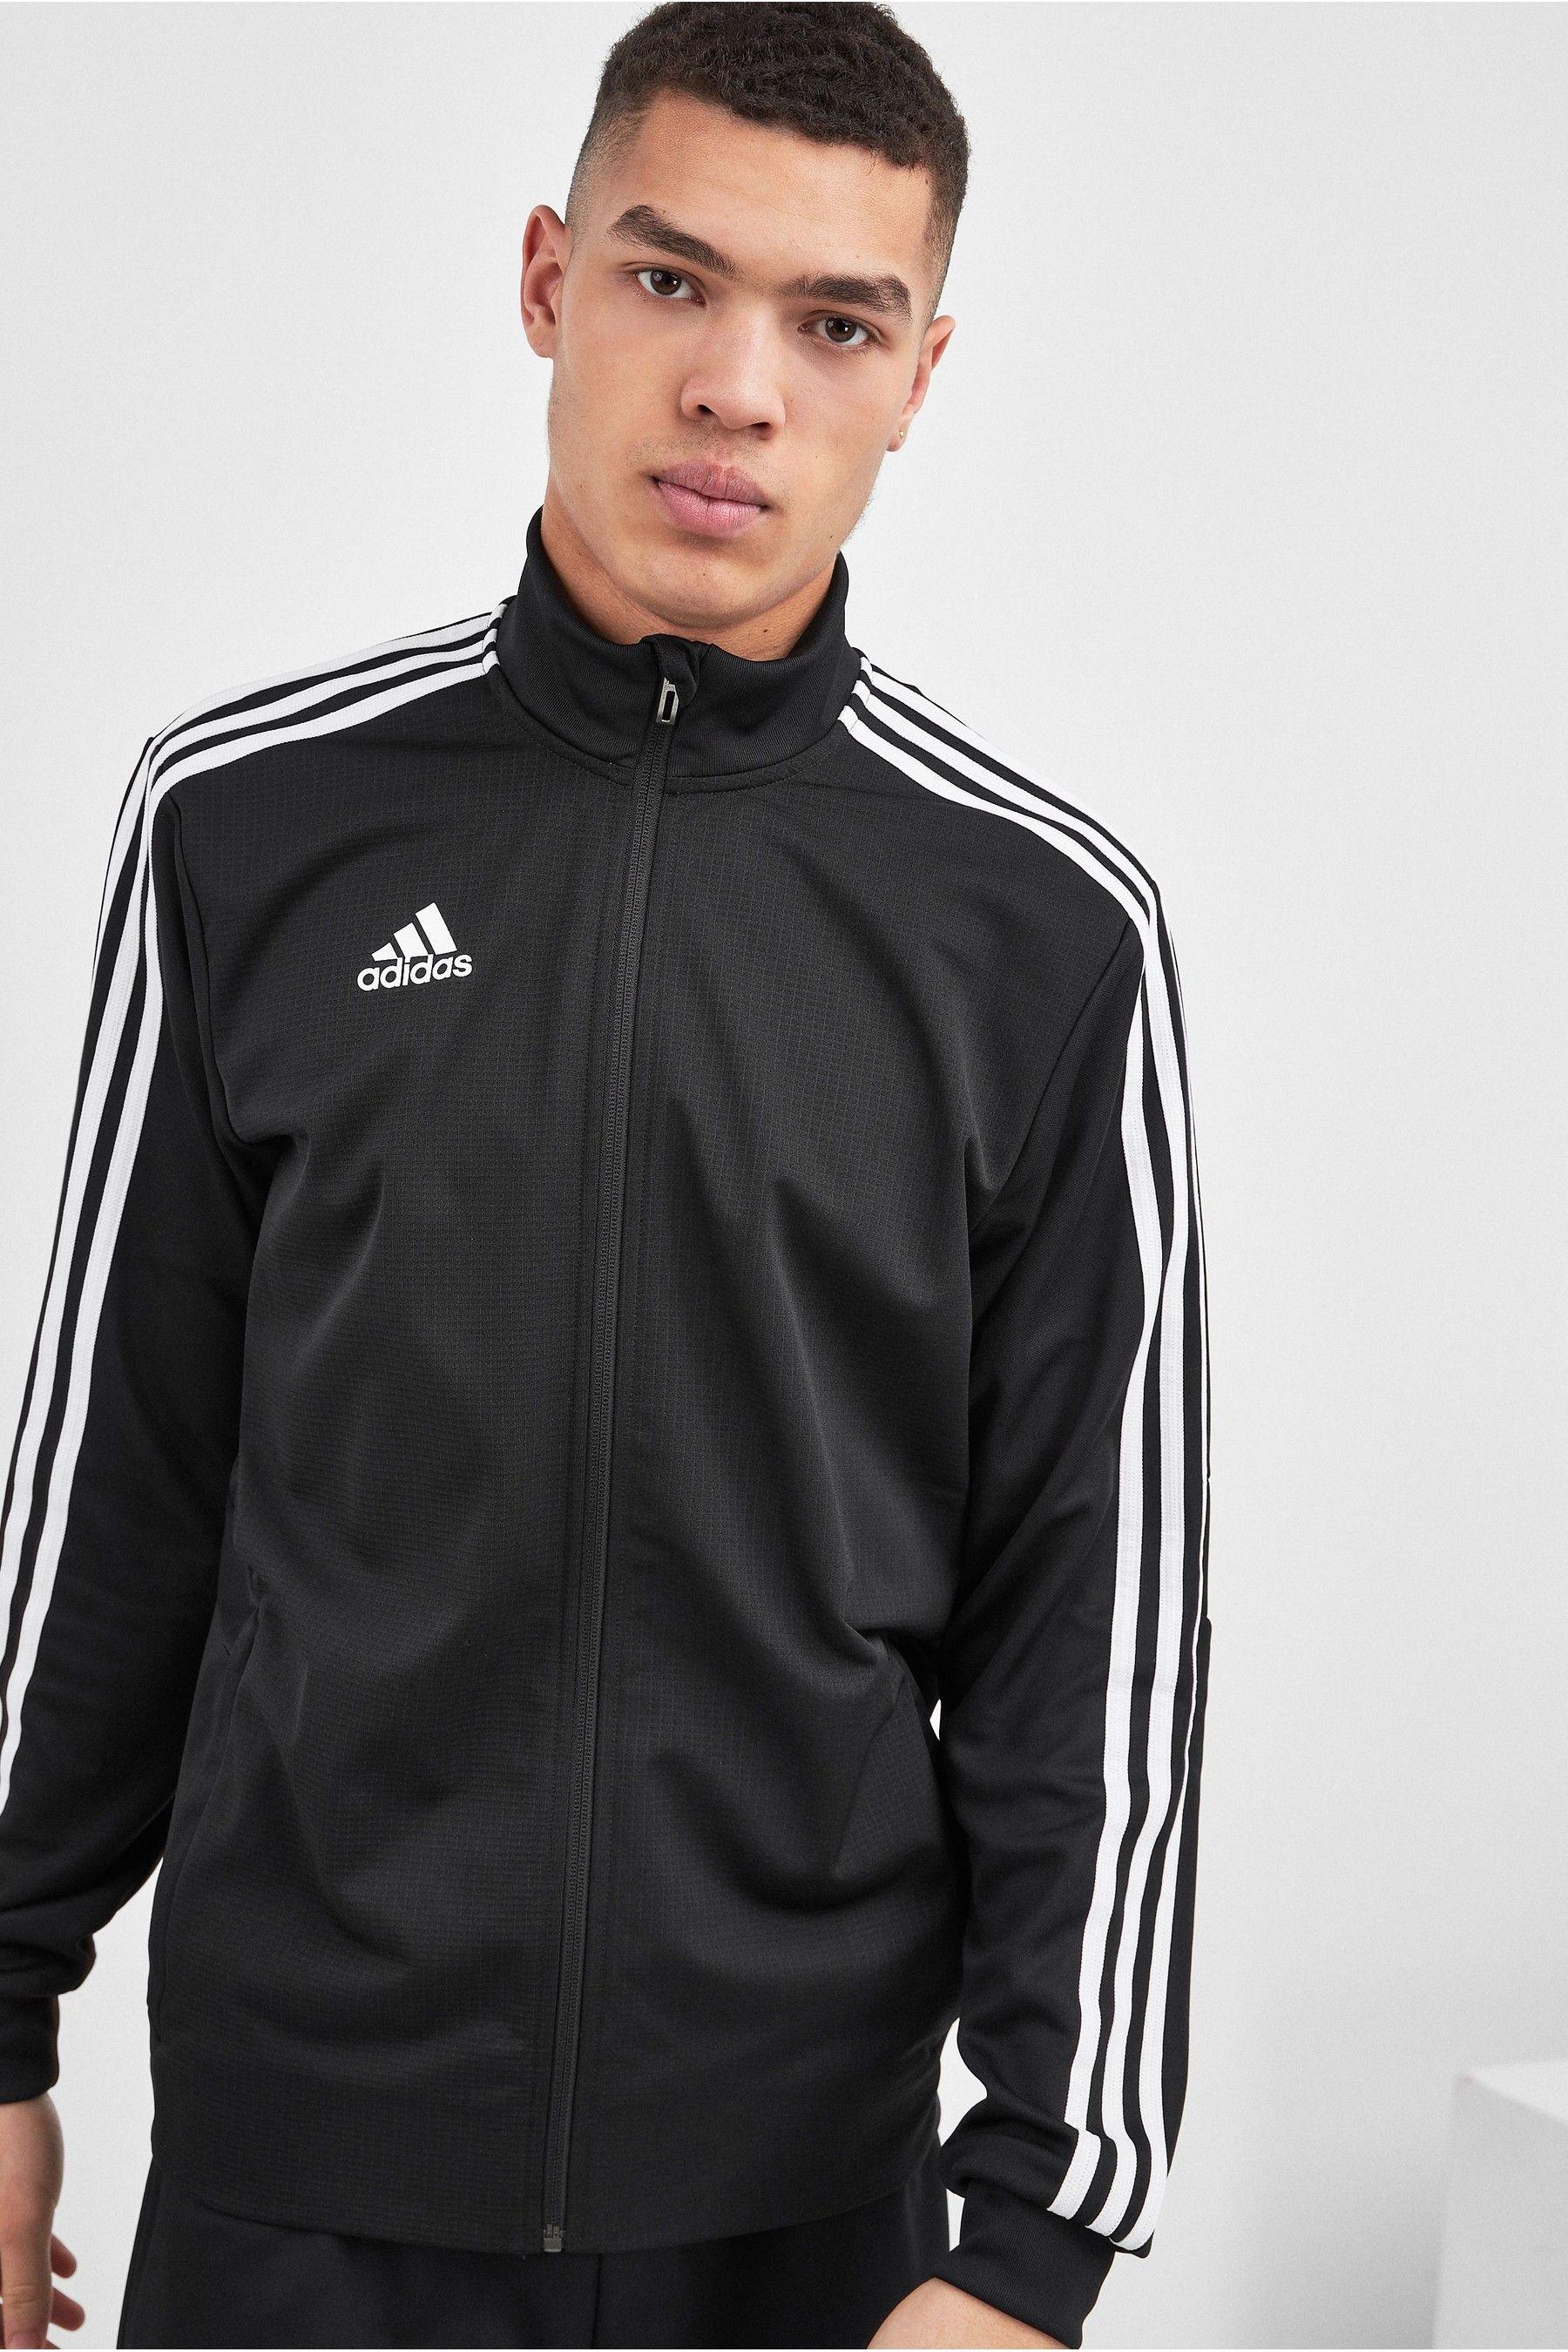 Mens adidas Tiro 19 Track Top Black in 2019   Adidas men